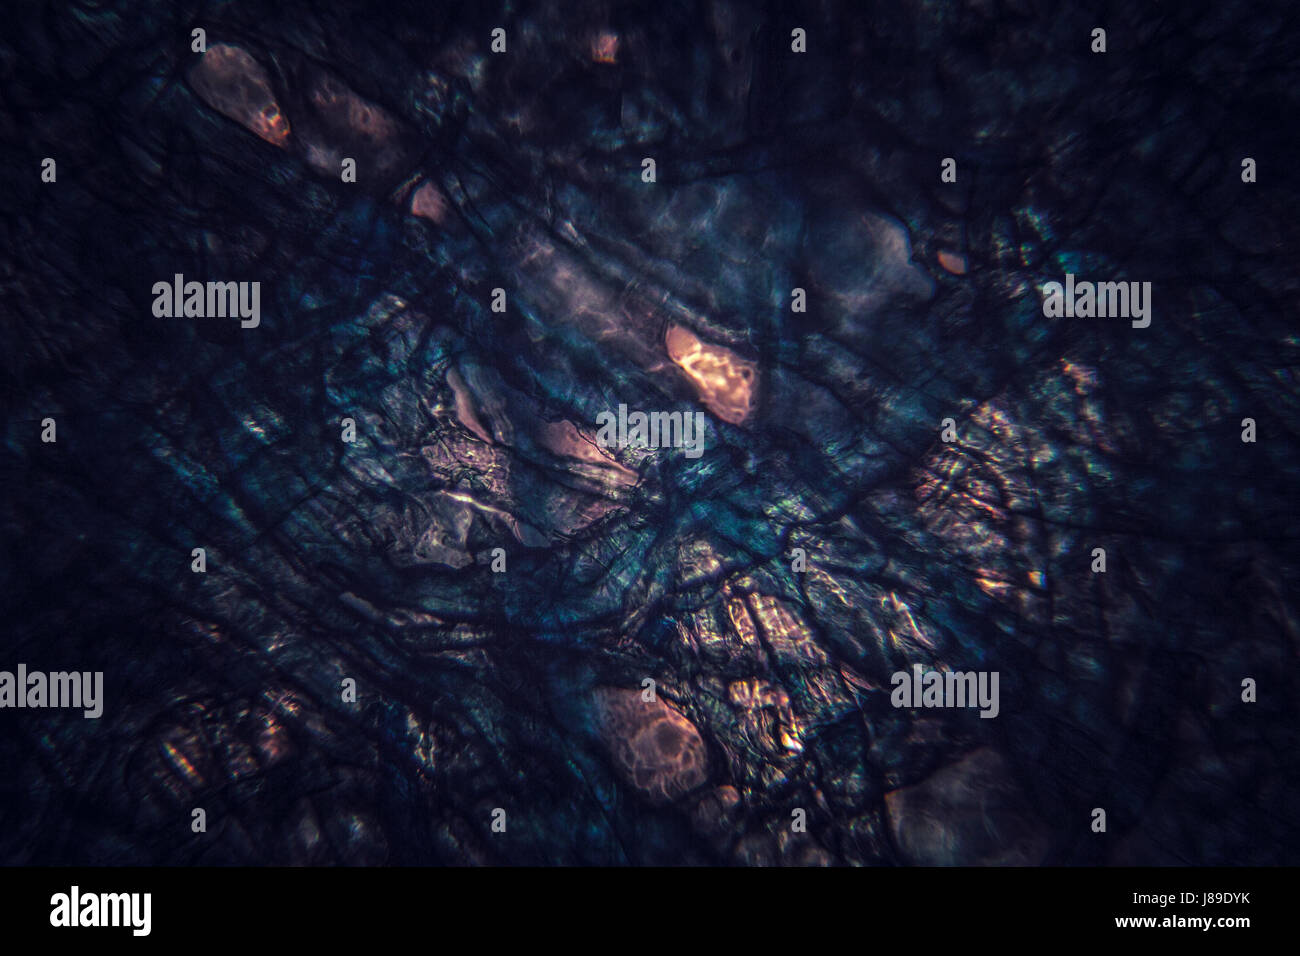 Dark microscopic organic section, texture, background. - Stock Image